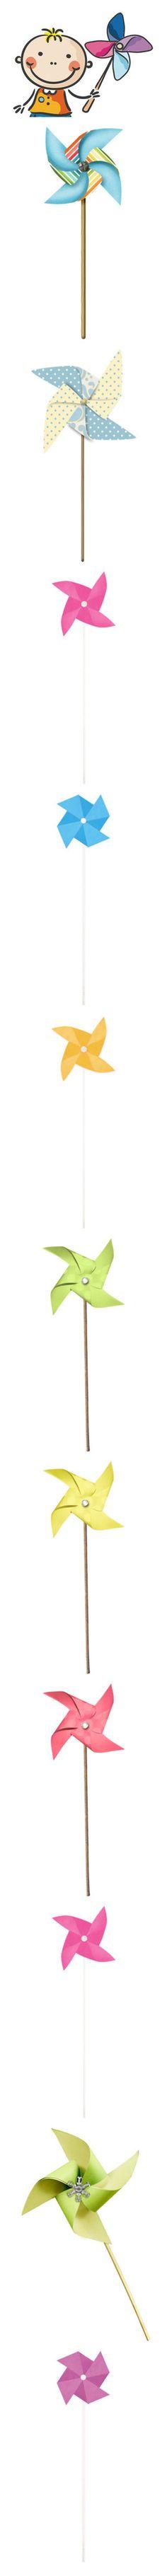 """Pinwheels"" by zipora-b ❤ liked on Polyvore featuring filler, toys, home, outdoors, outdoor decor, silver, garden decor, outside garden decor, whimsical garden decor and outdoor patio decor"